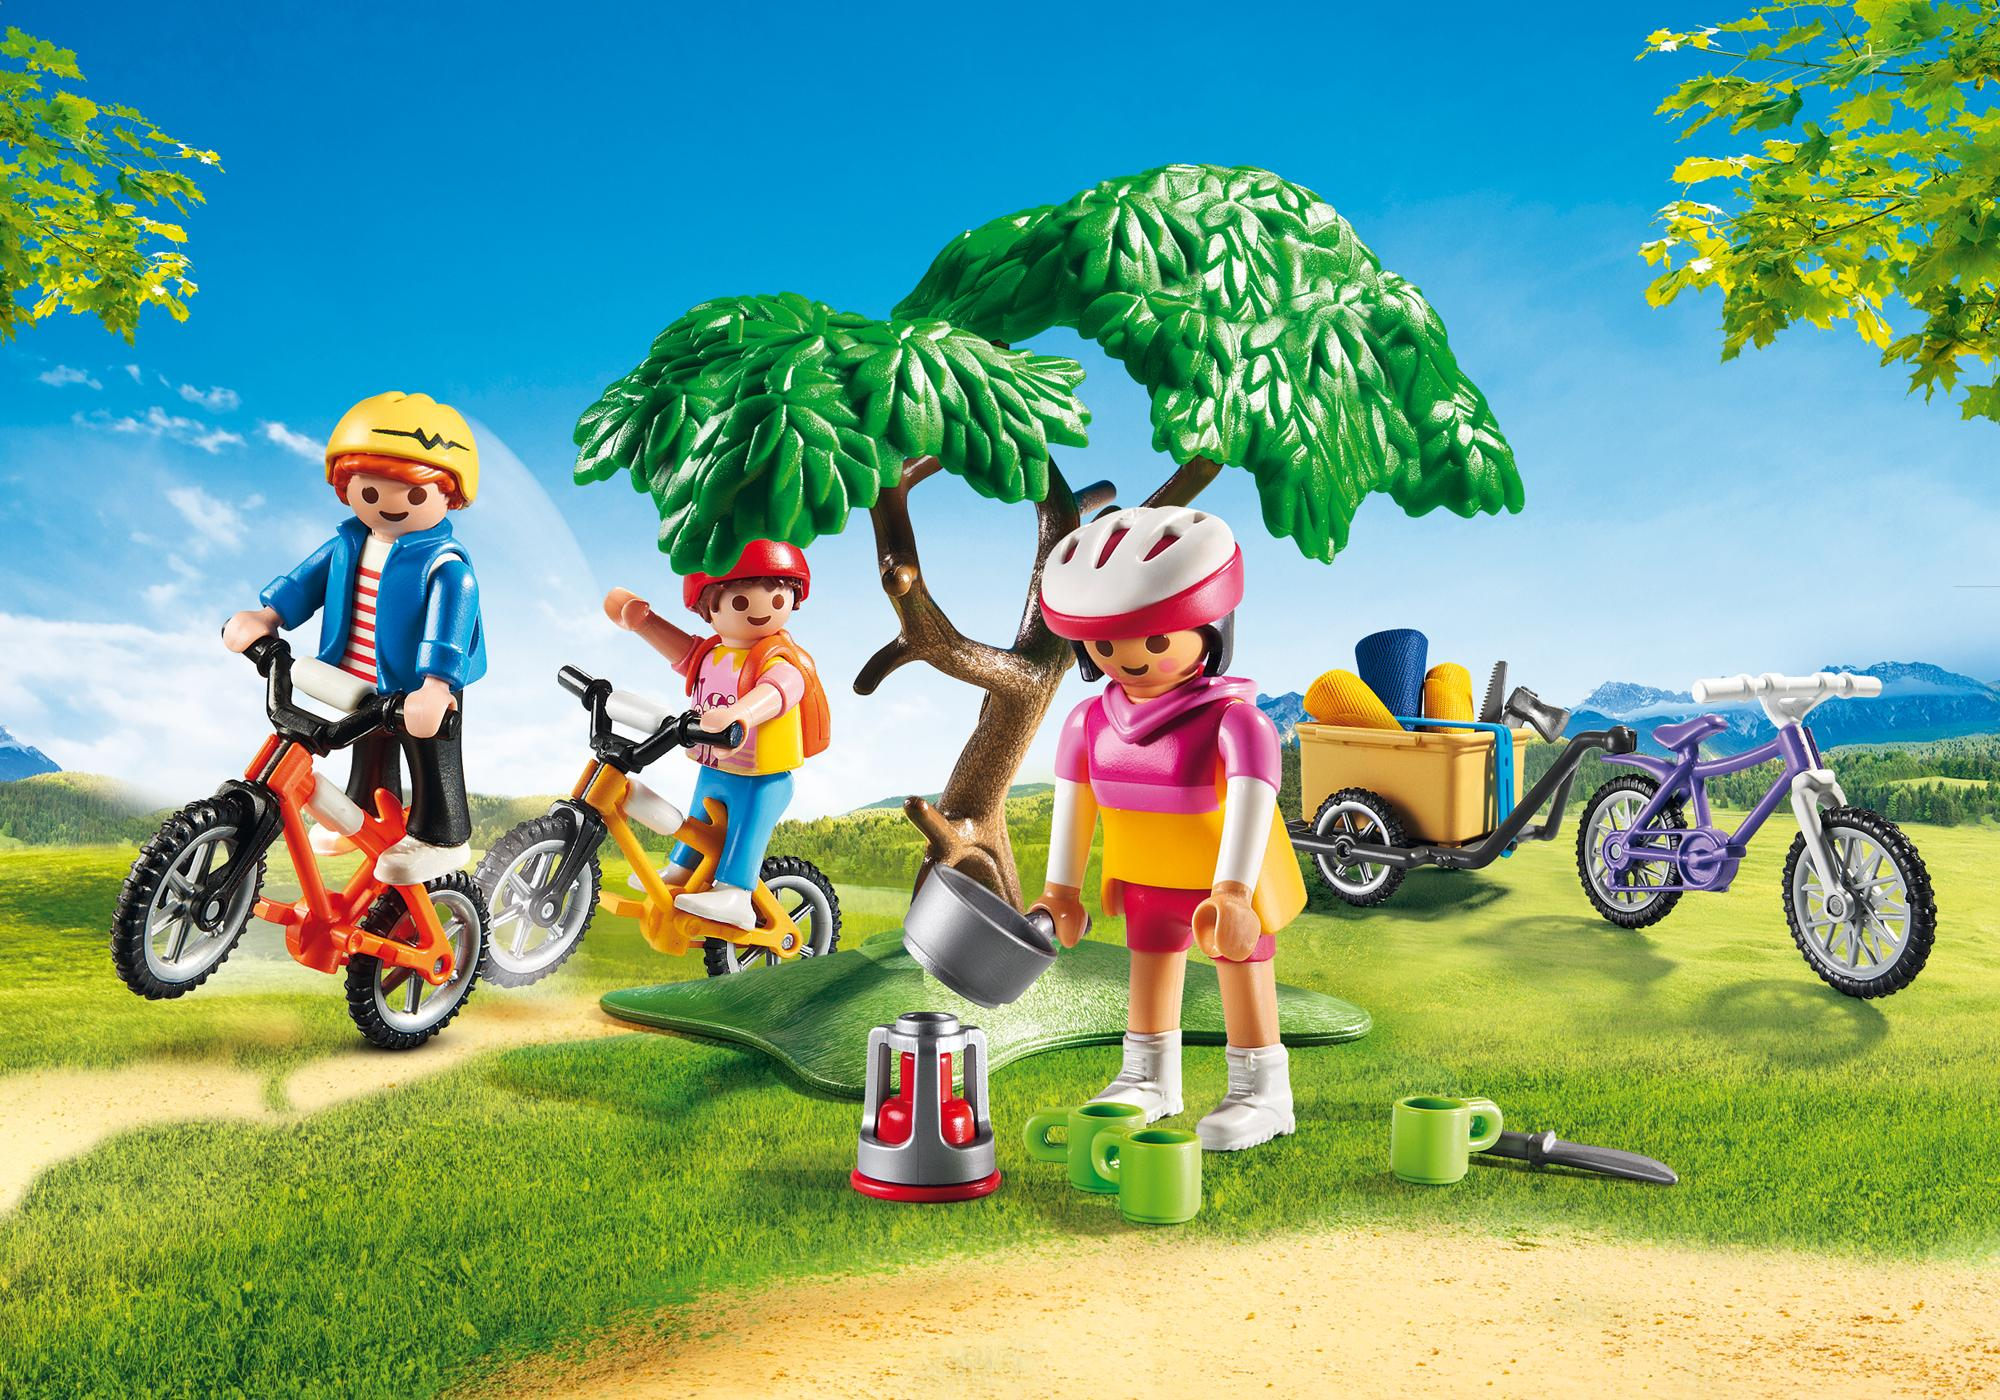 http://media.playmobil.com/i/playmobil/6890_product_detail